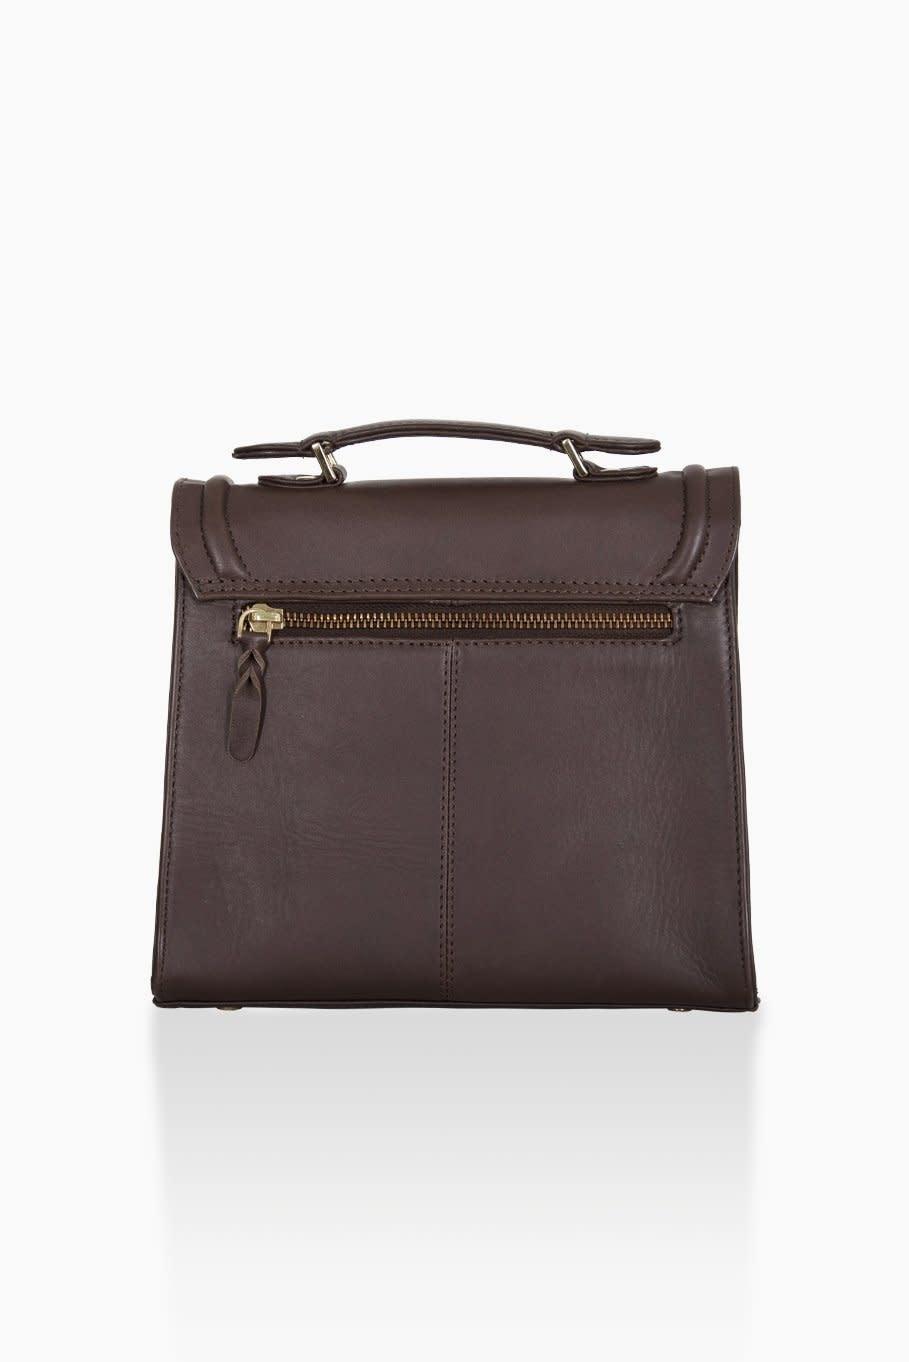 Détail Detail Balance handbag Fondant anaconda 22 x 9 x 18 cm